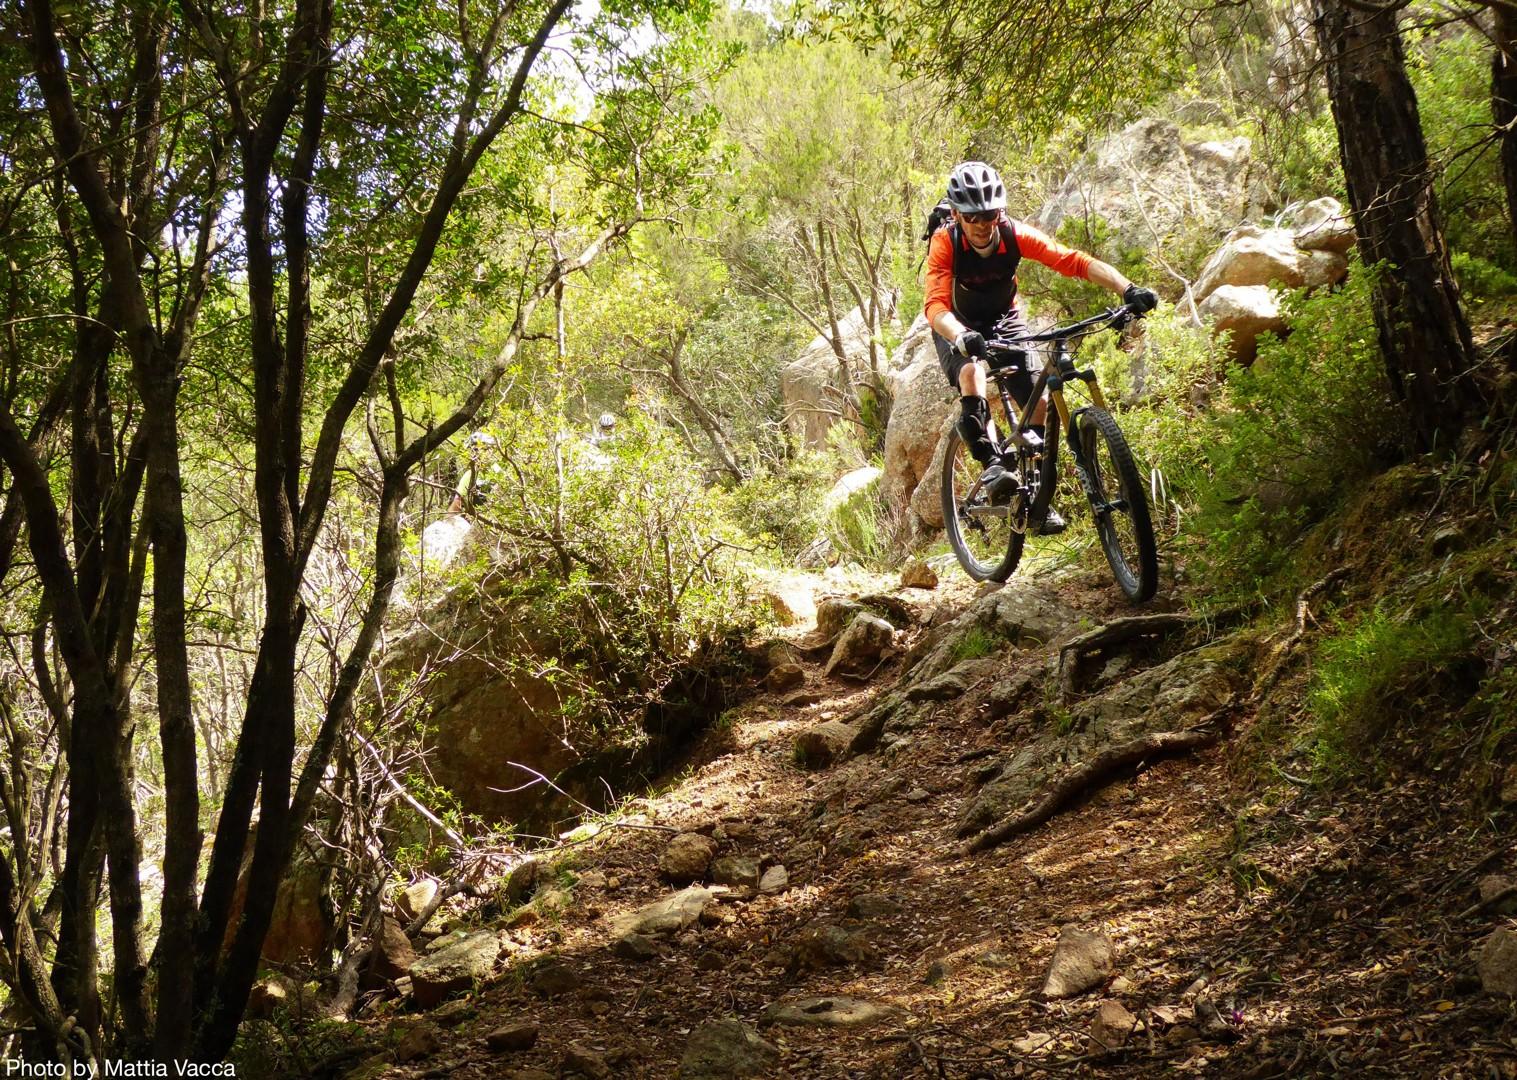 pula-enduro-in-italy-sardinia-mountain-bike-holiday.jpg - Sardinia - Sardinian Enduro - Italia Mountain Biking